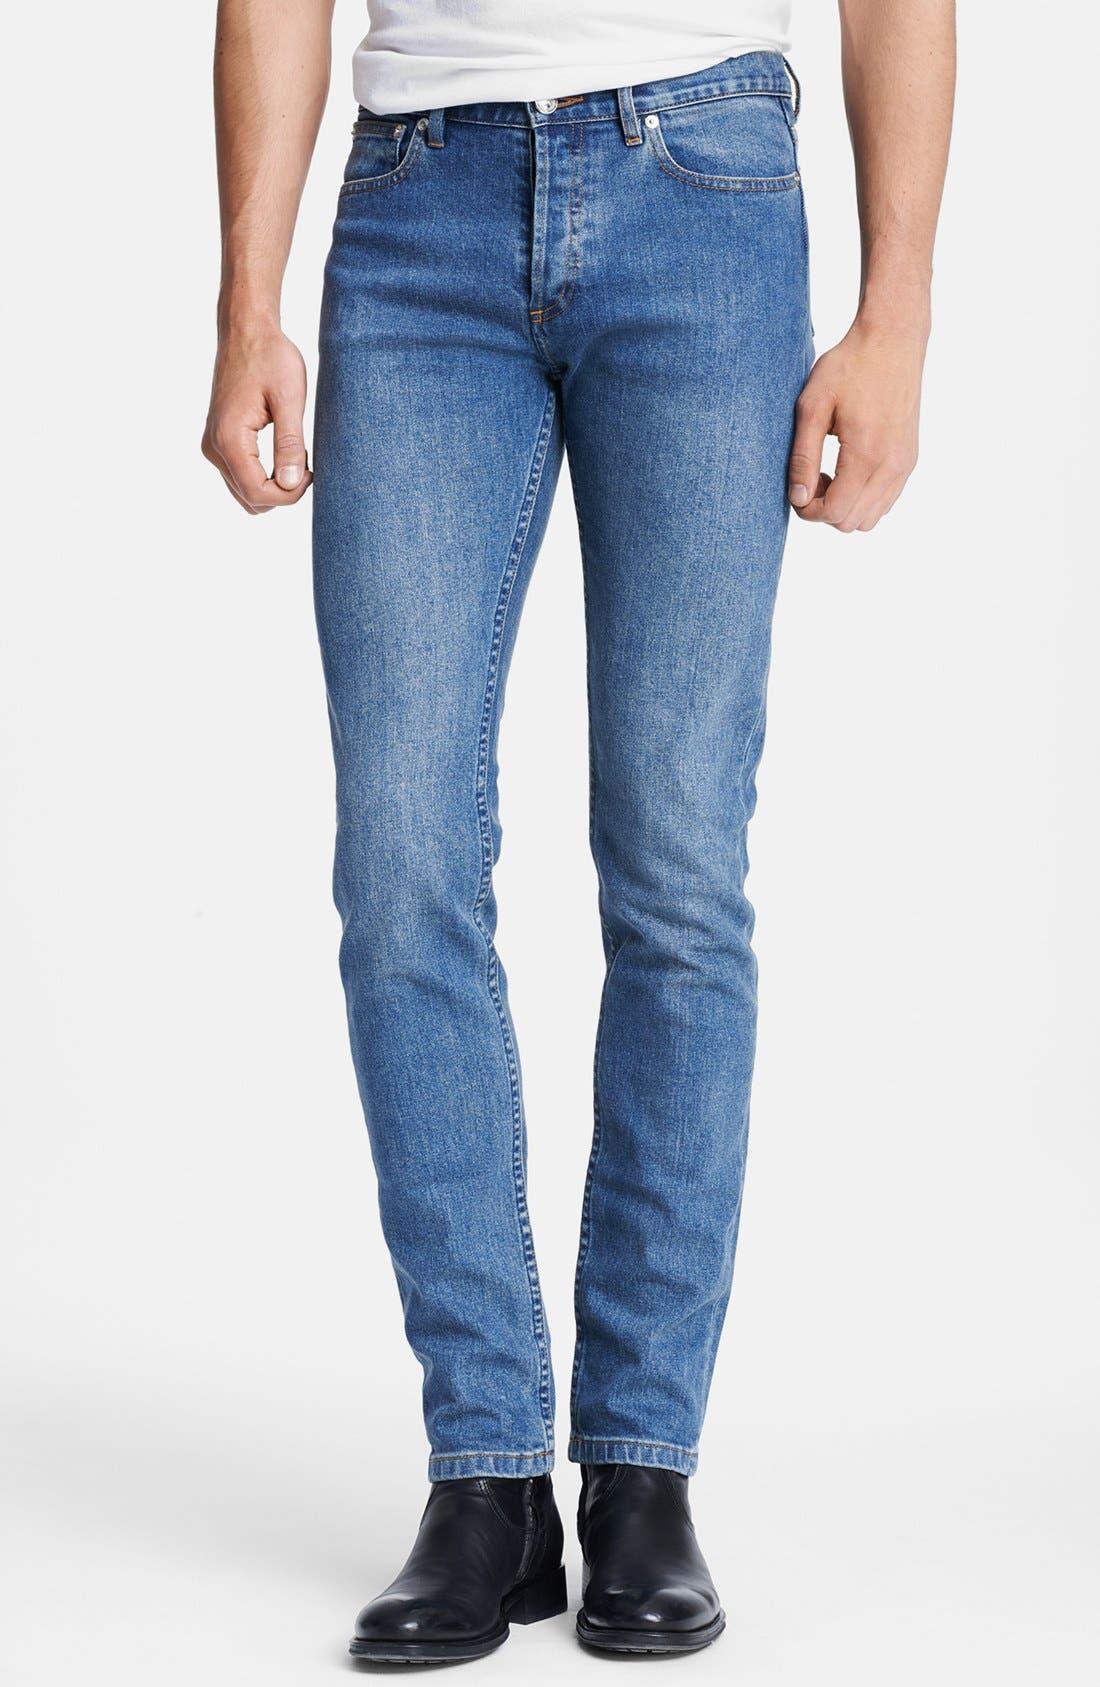 Main Image - A.P.C. 'Petit New Standard' Skinny Fit Jeans (Denim Blue)